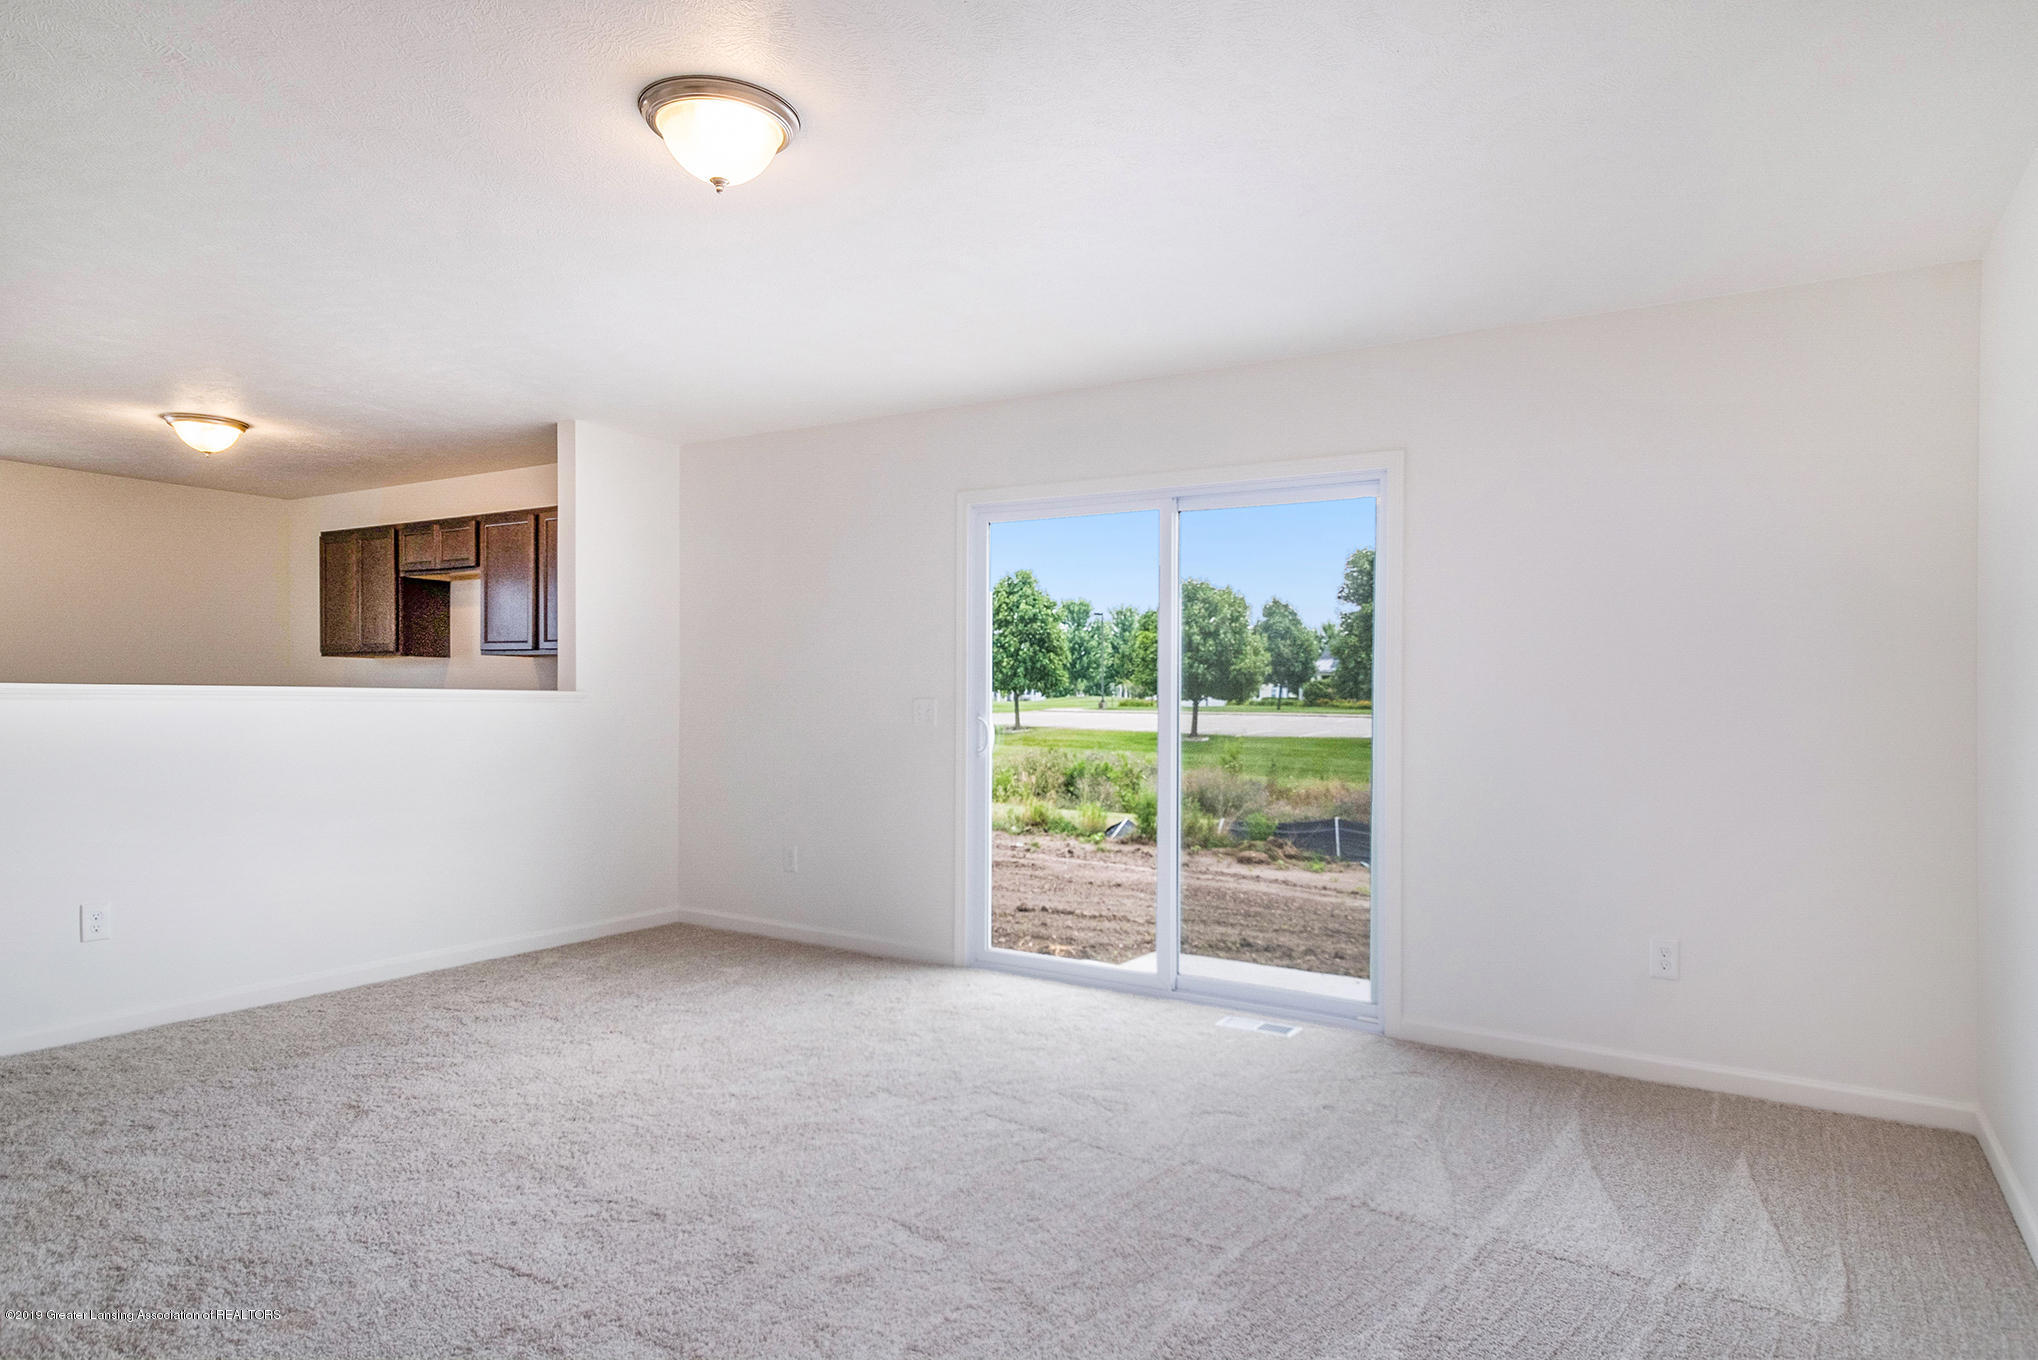 929 Bolton Farms Ln - GF2033-i1560-Great Room1 - 5